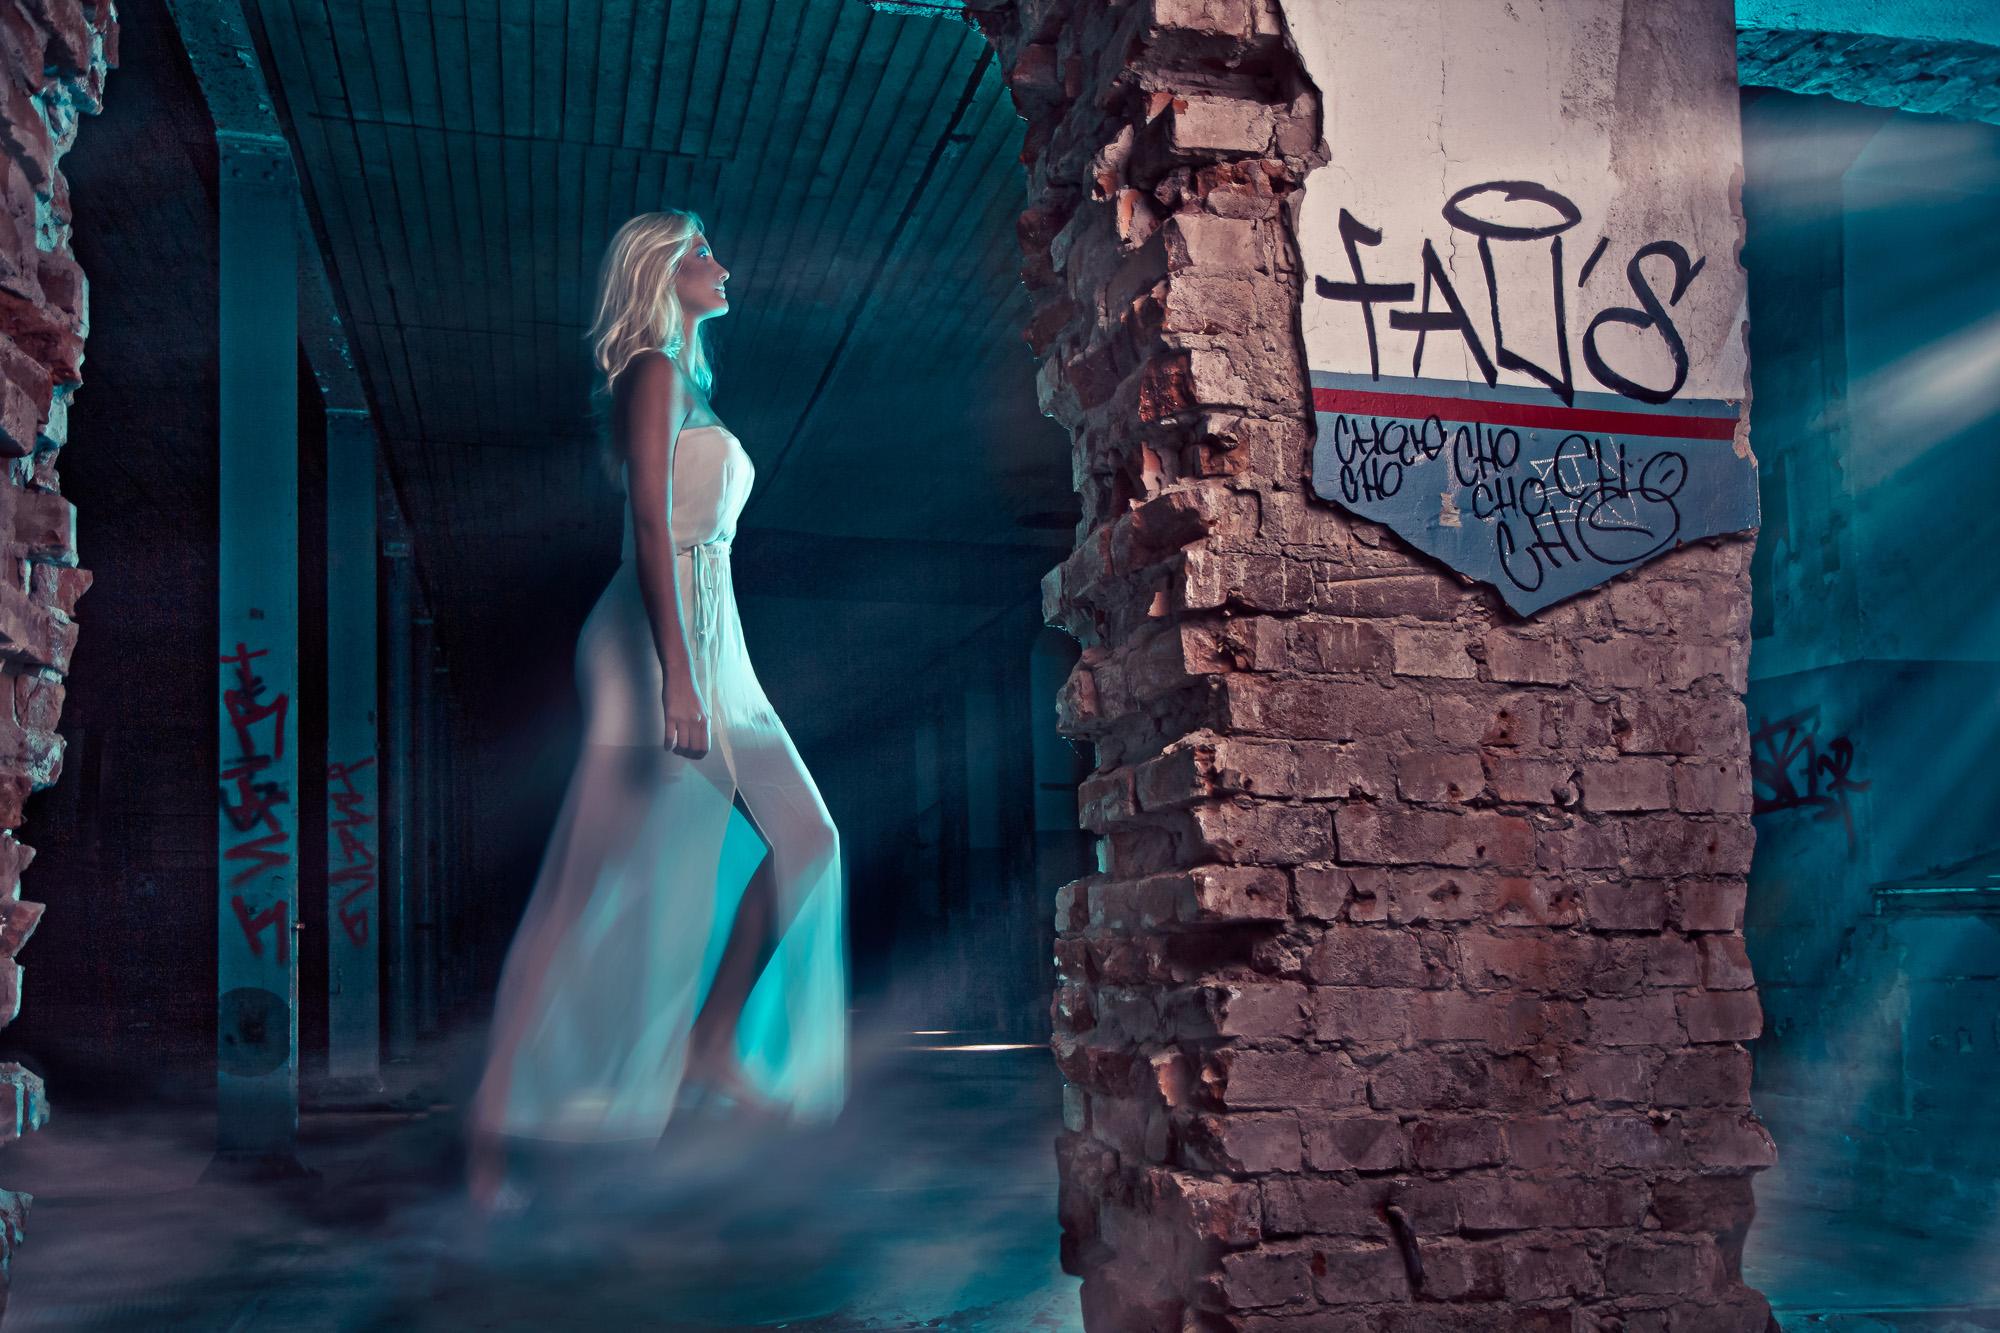 emelie_fors_fabriker_2012_niklaswikstrom-182-Edit-portfolio2012_niklaswikstrom10027